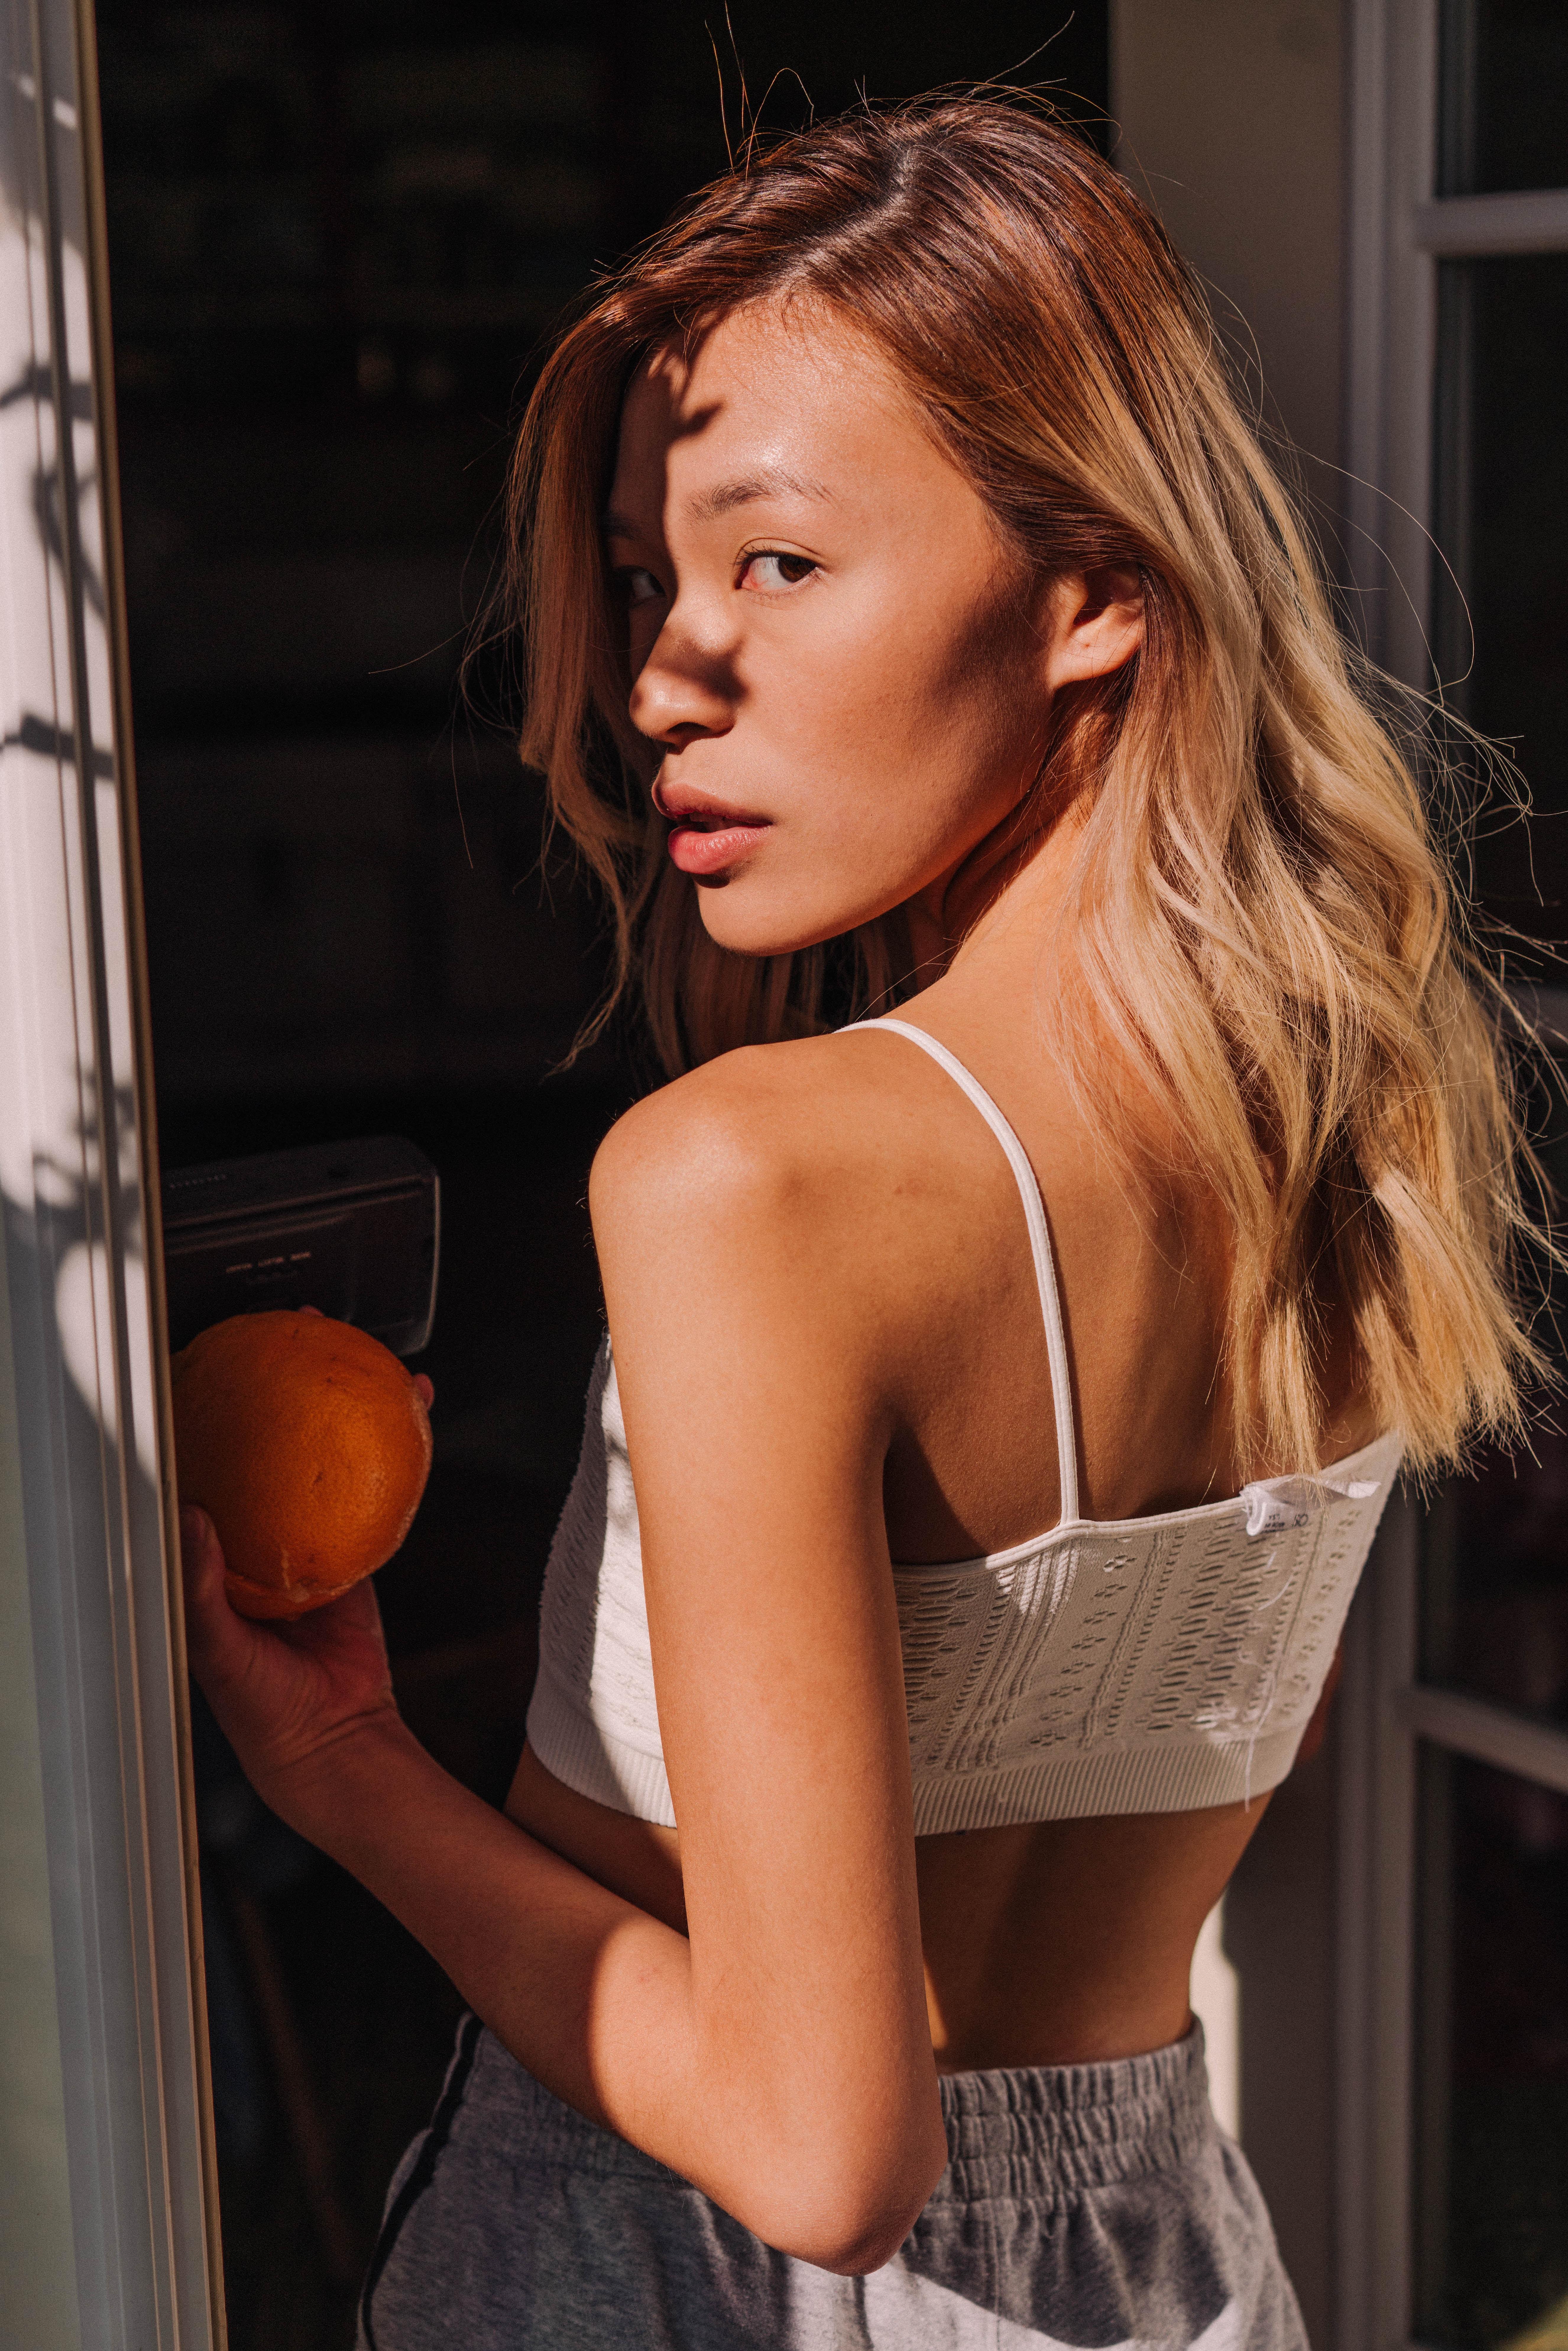 woman wearing white spaghetti strap crop top and holding orange fruit